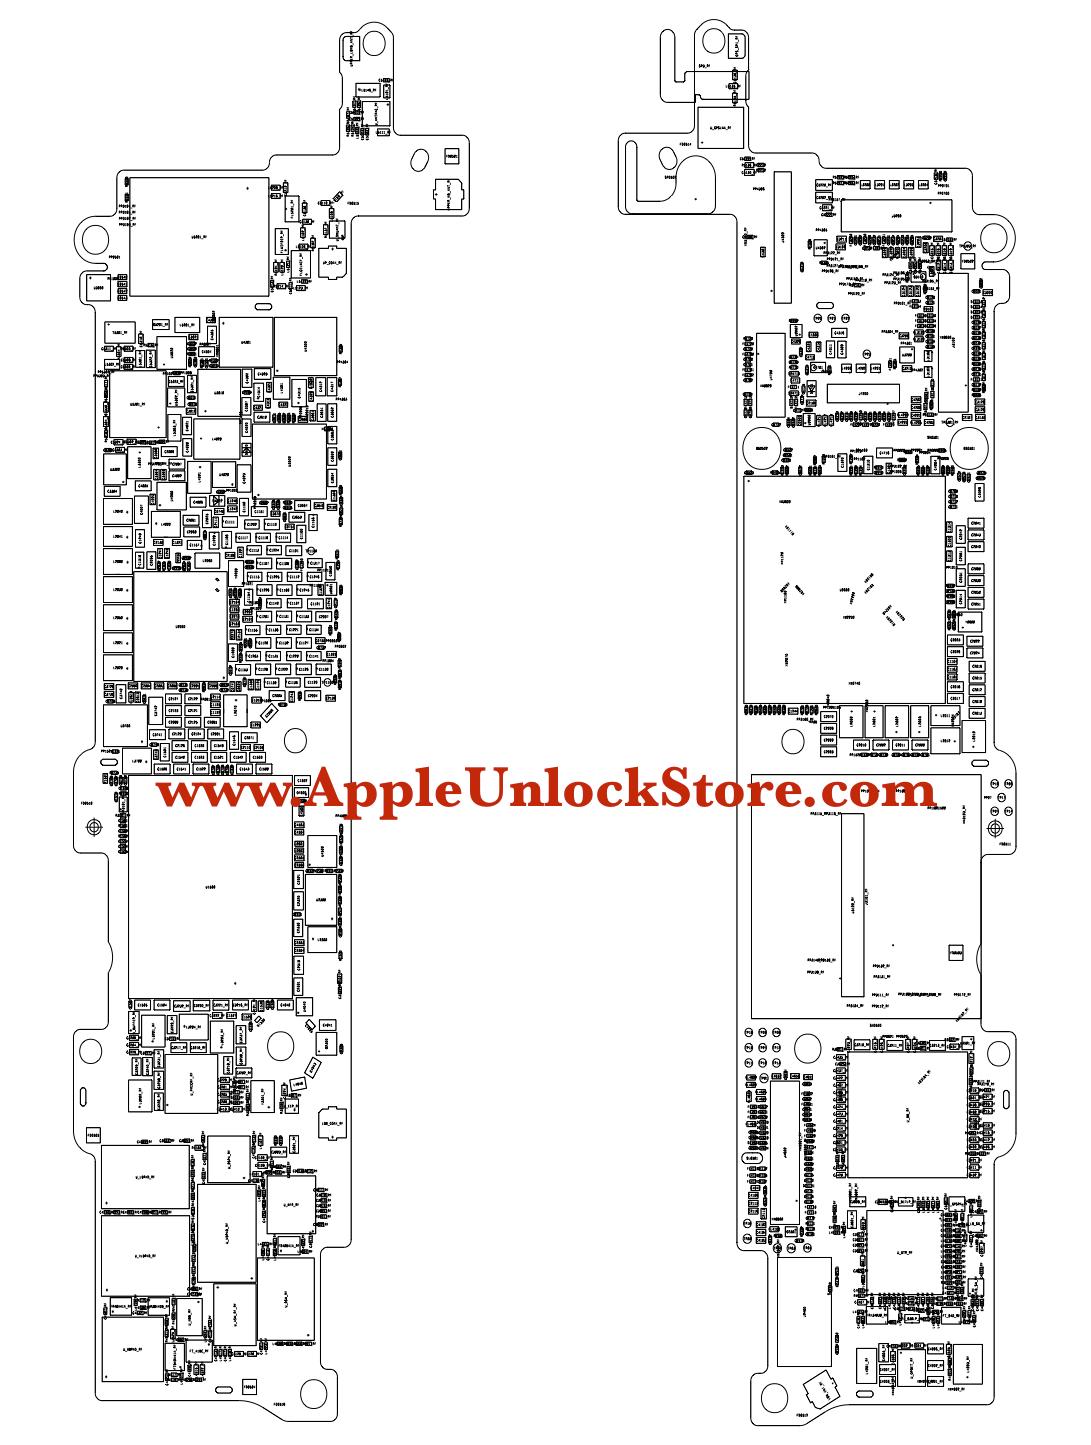 iphone 3gs schematic diagram 2017 ford f150 stereo wiring schematics 5